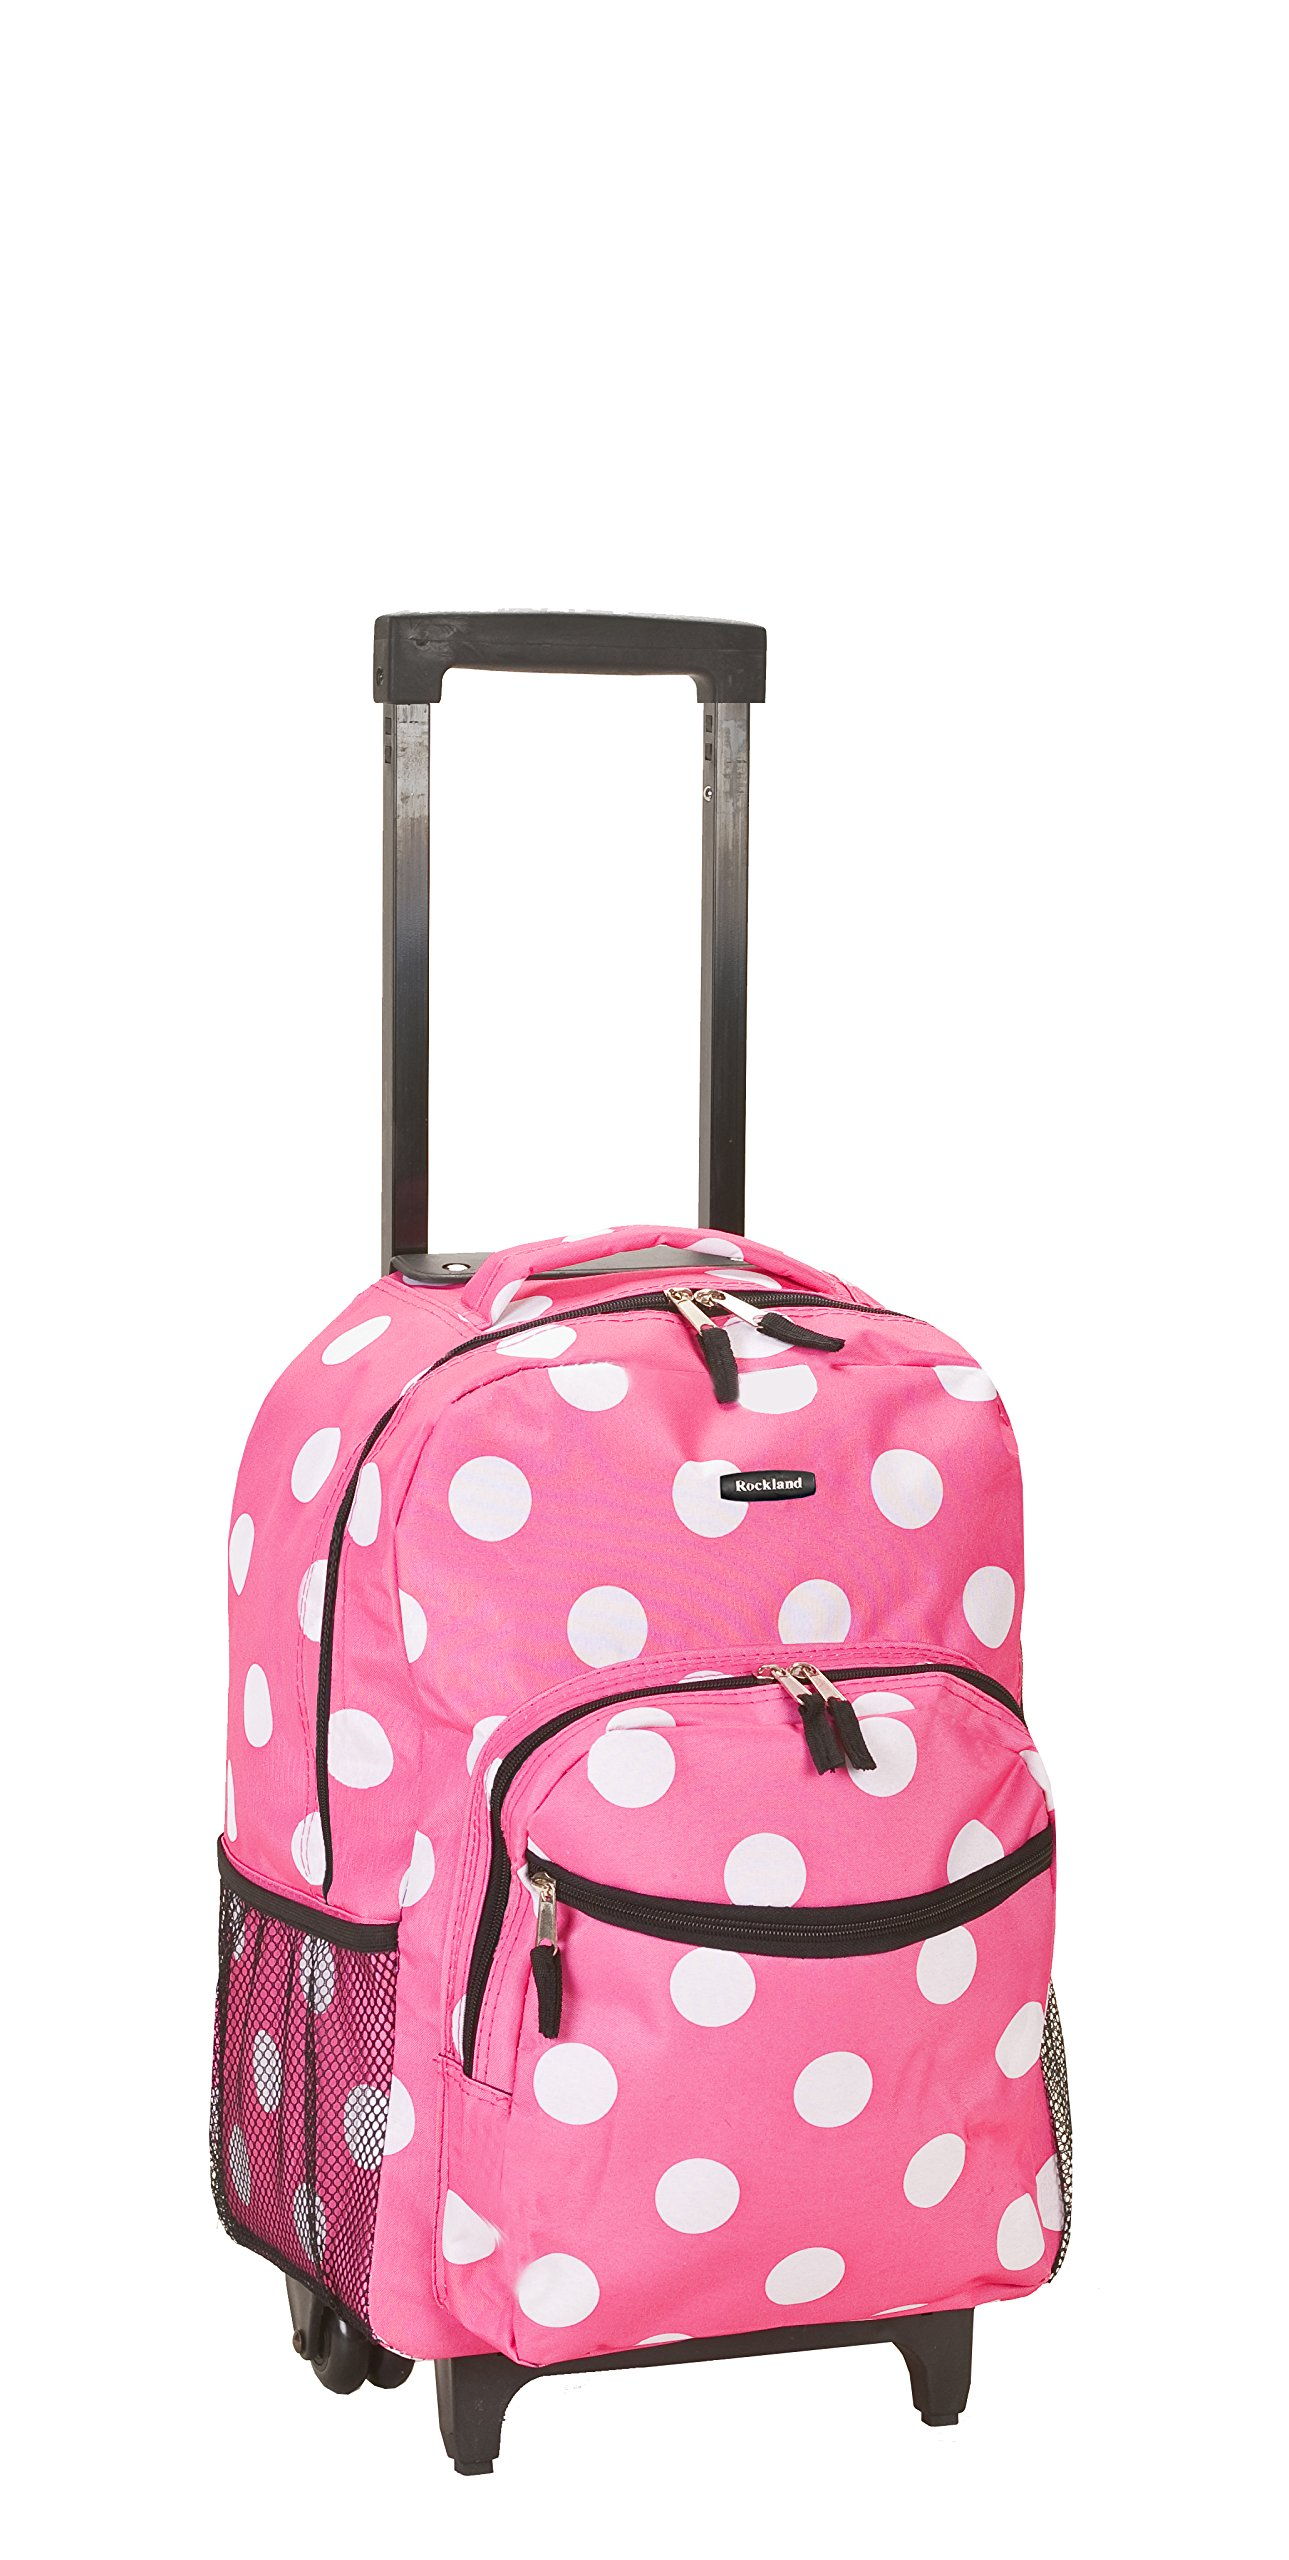 Girls School Bag Rolling Backpack Wheels Travel Kids Children